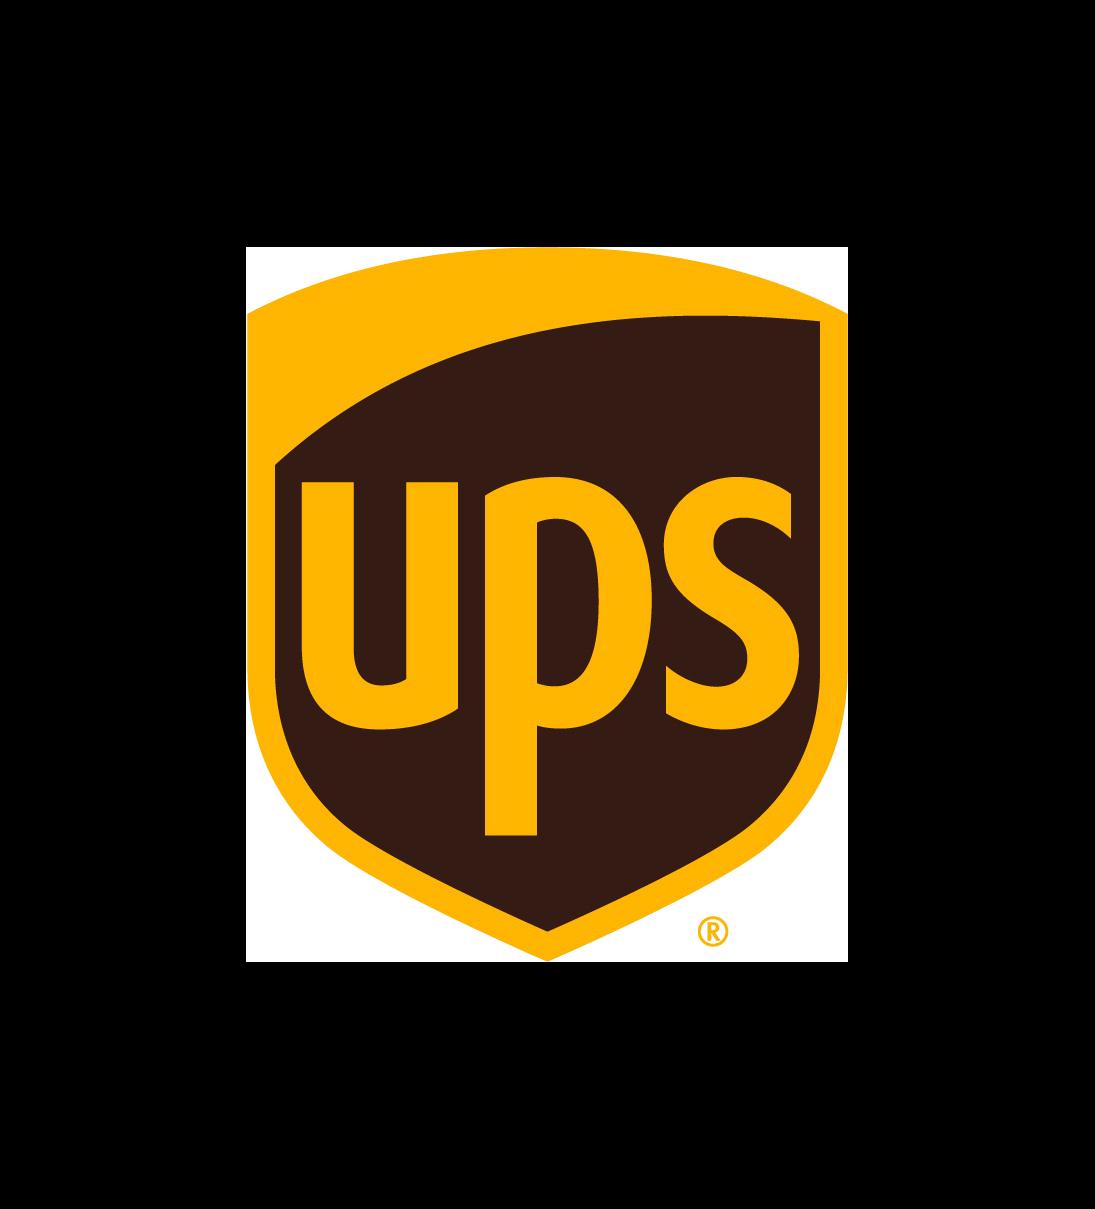 ups_14_logo_lg_rgb_Fullsize_TRANS